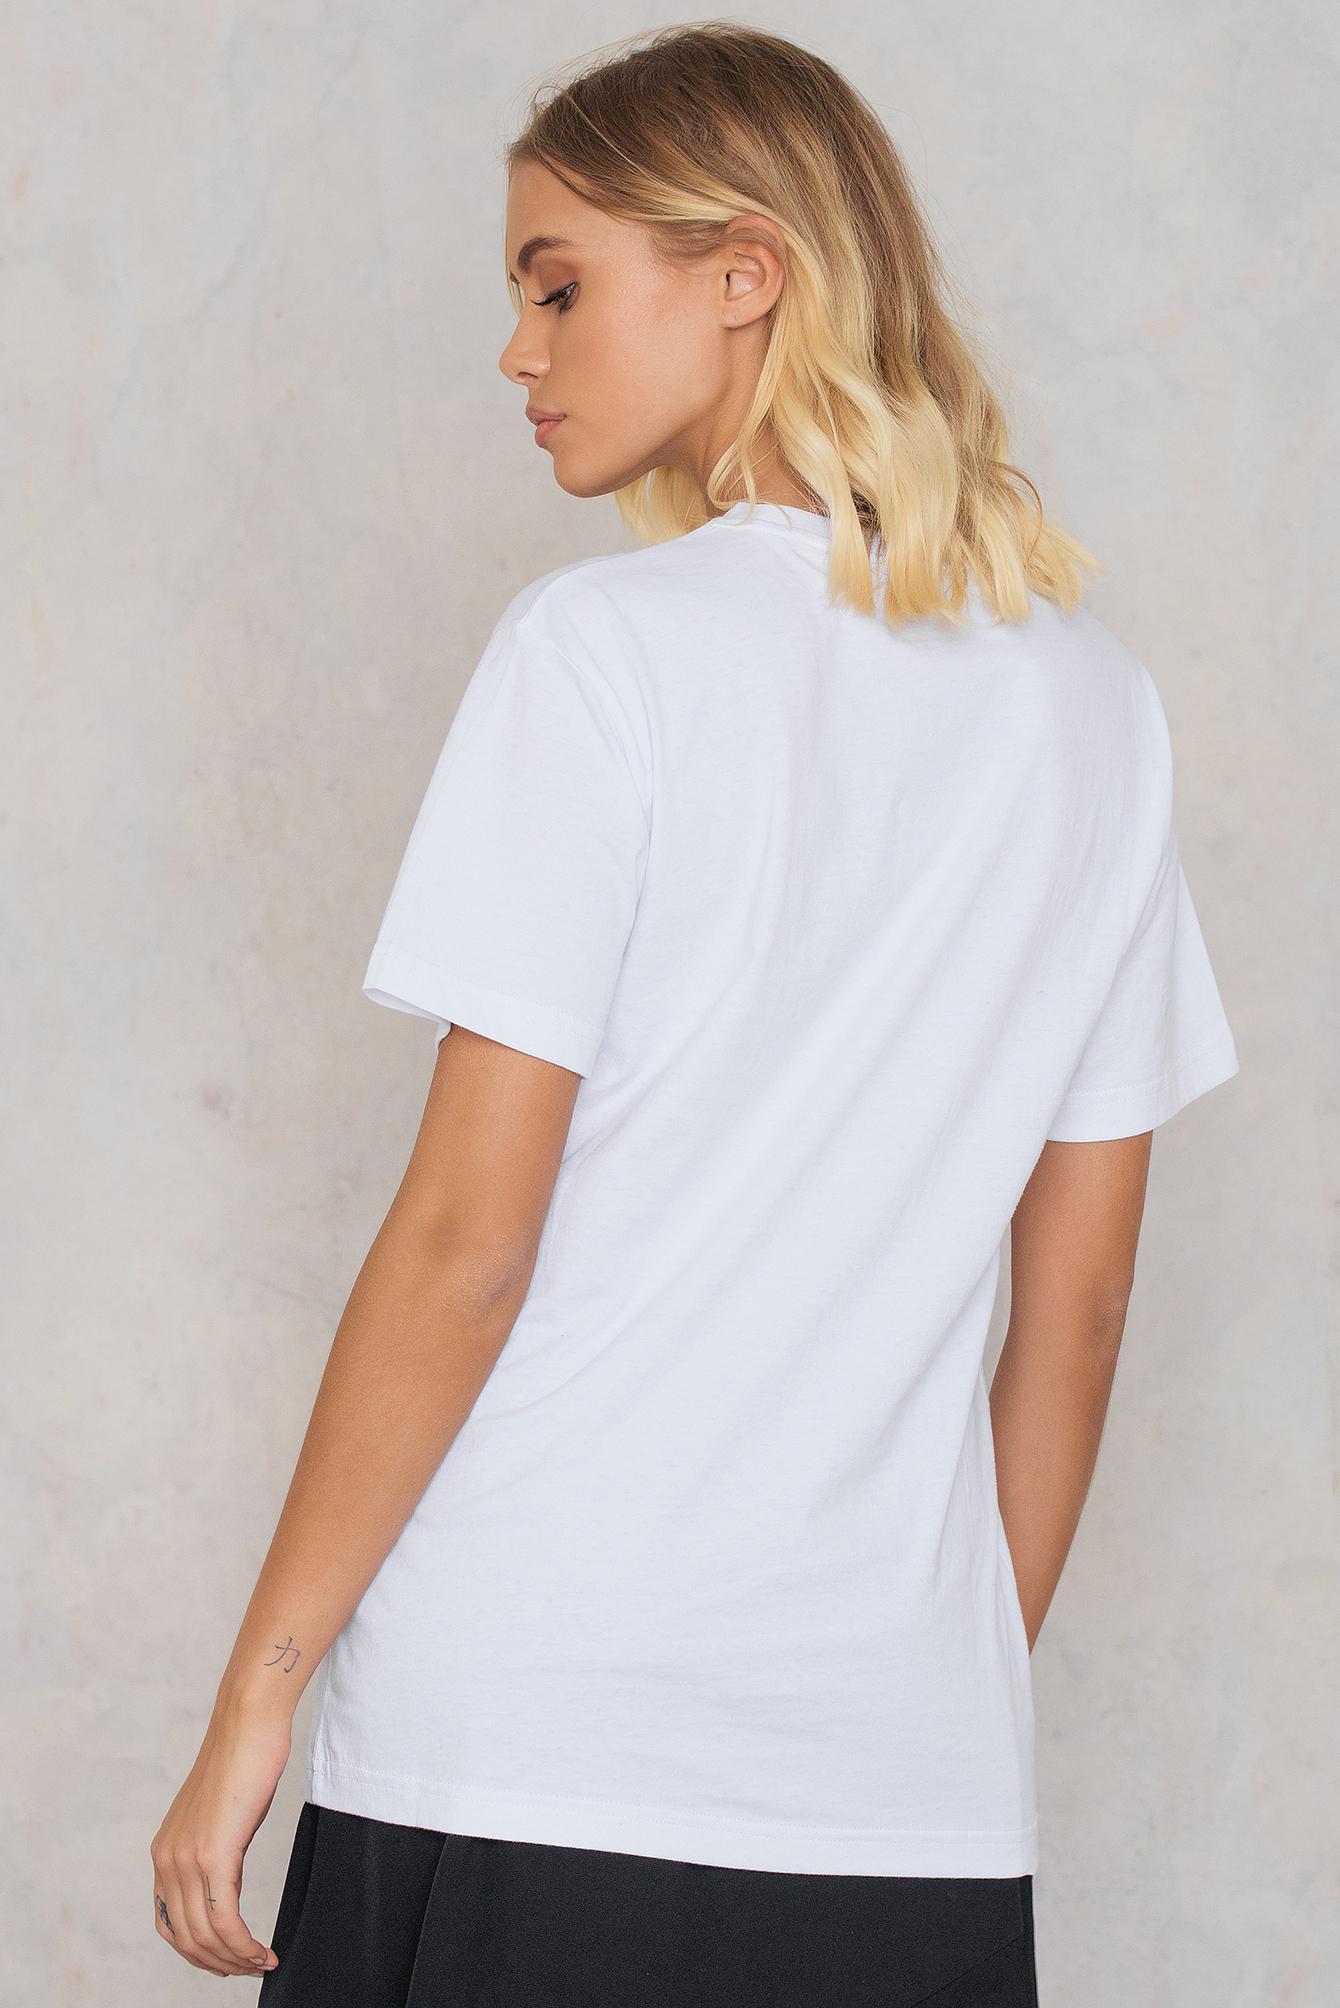 Lyst ellesse al albany t shirt in white for T shirt printing mobile al